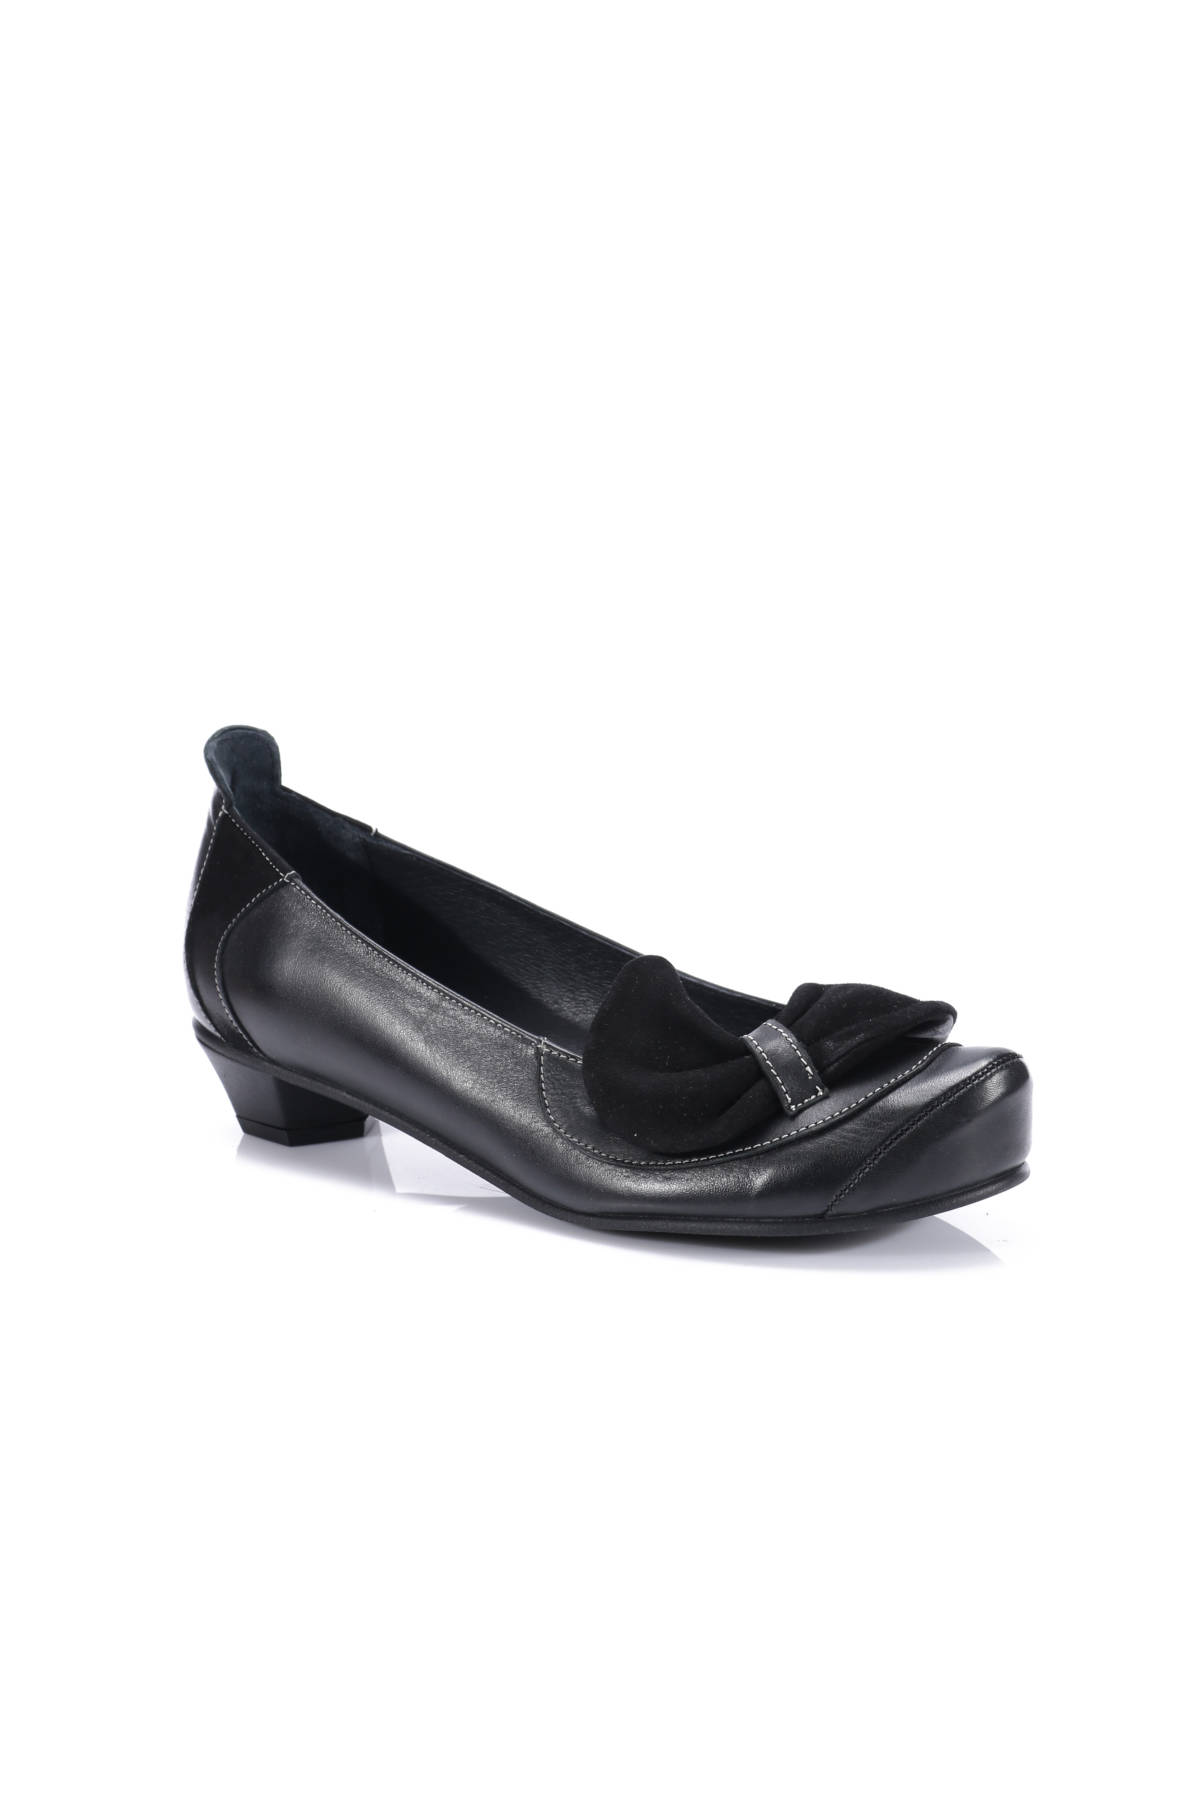 Ниски обувки Tiggers1